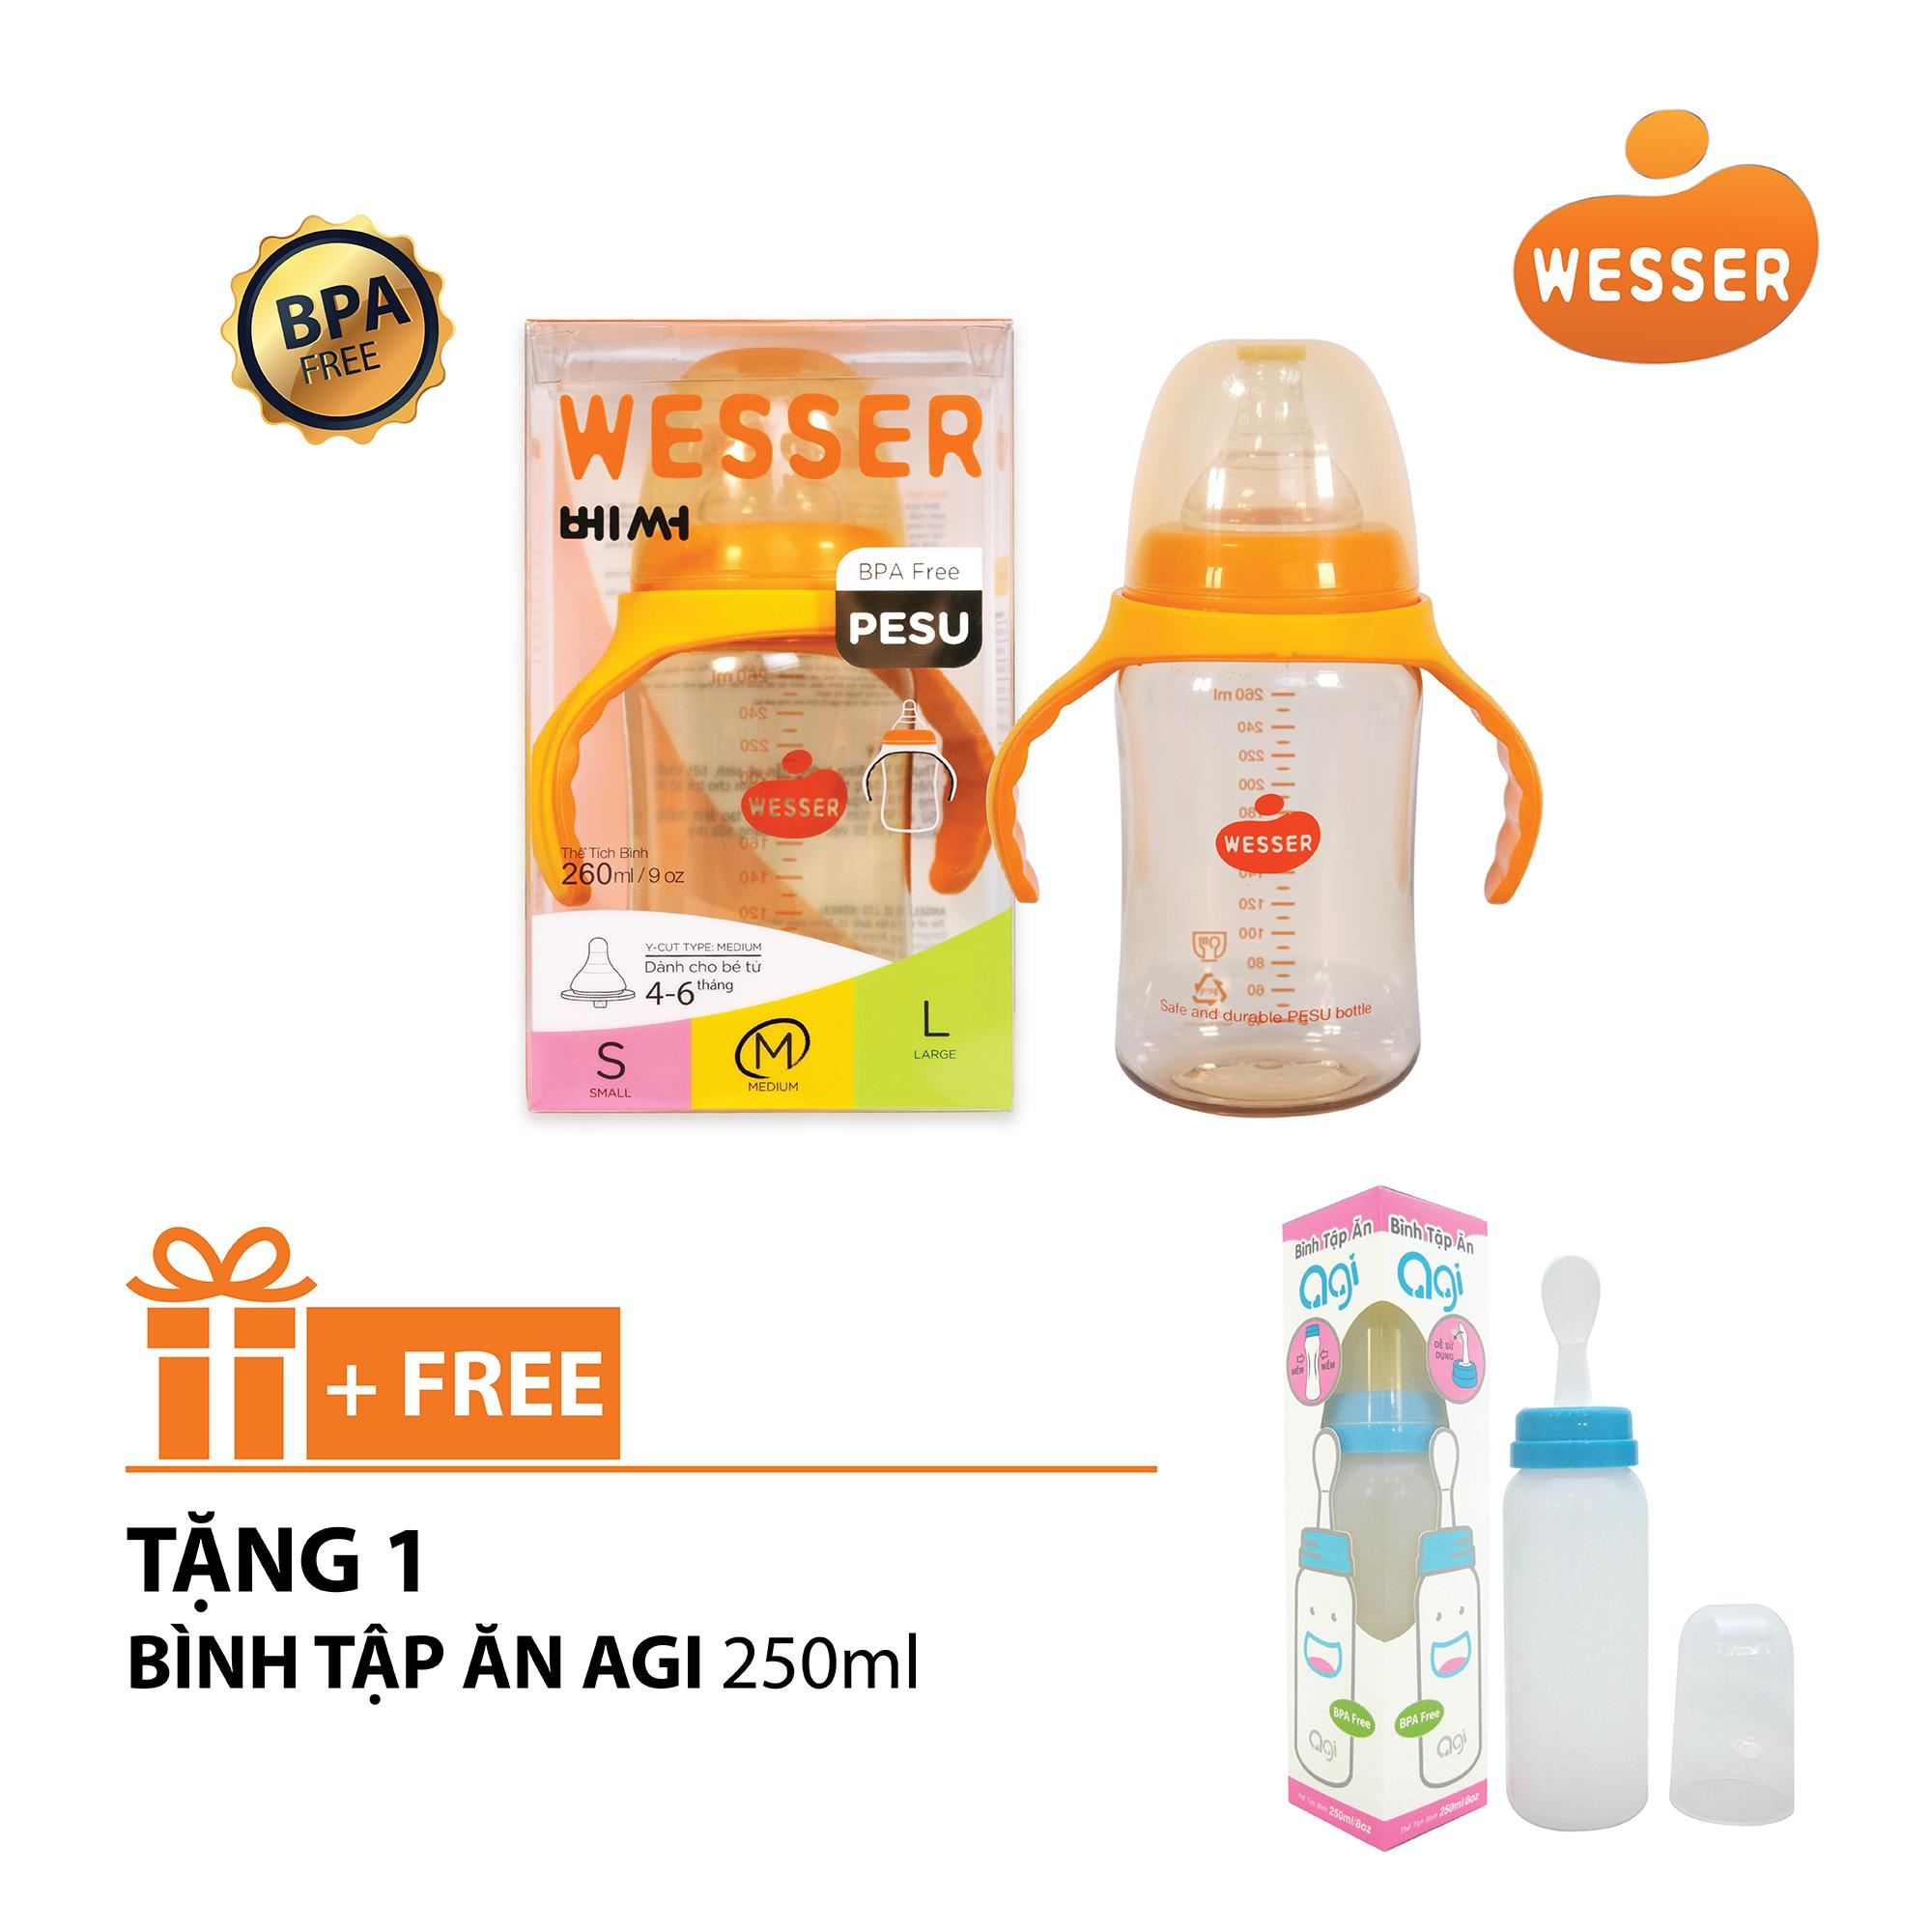 Hot Deal Khi Mua Bình Sữa Wesser PESU 260ml + Tặng Bình Tập ăn Agi 250ml